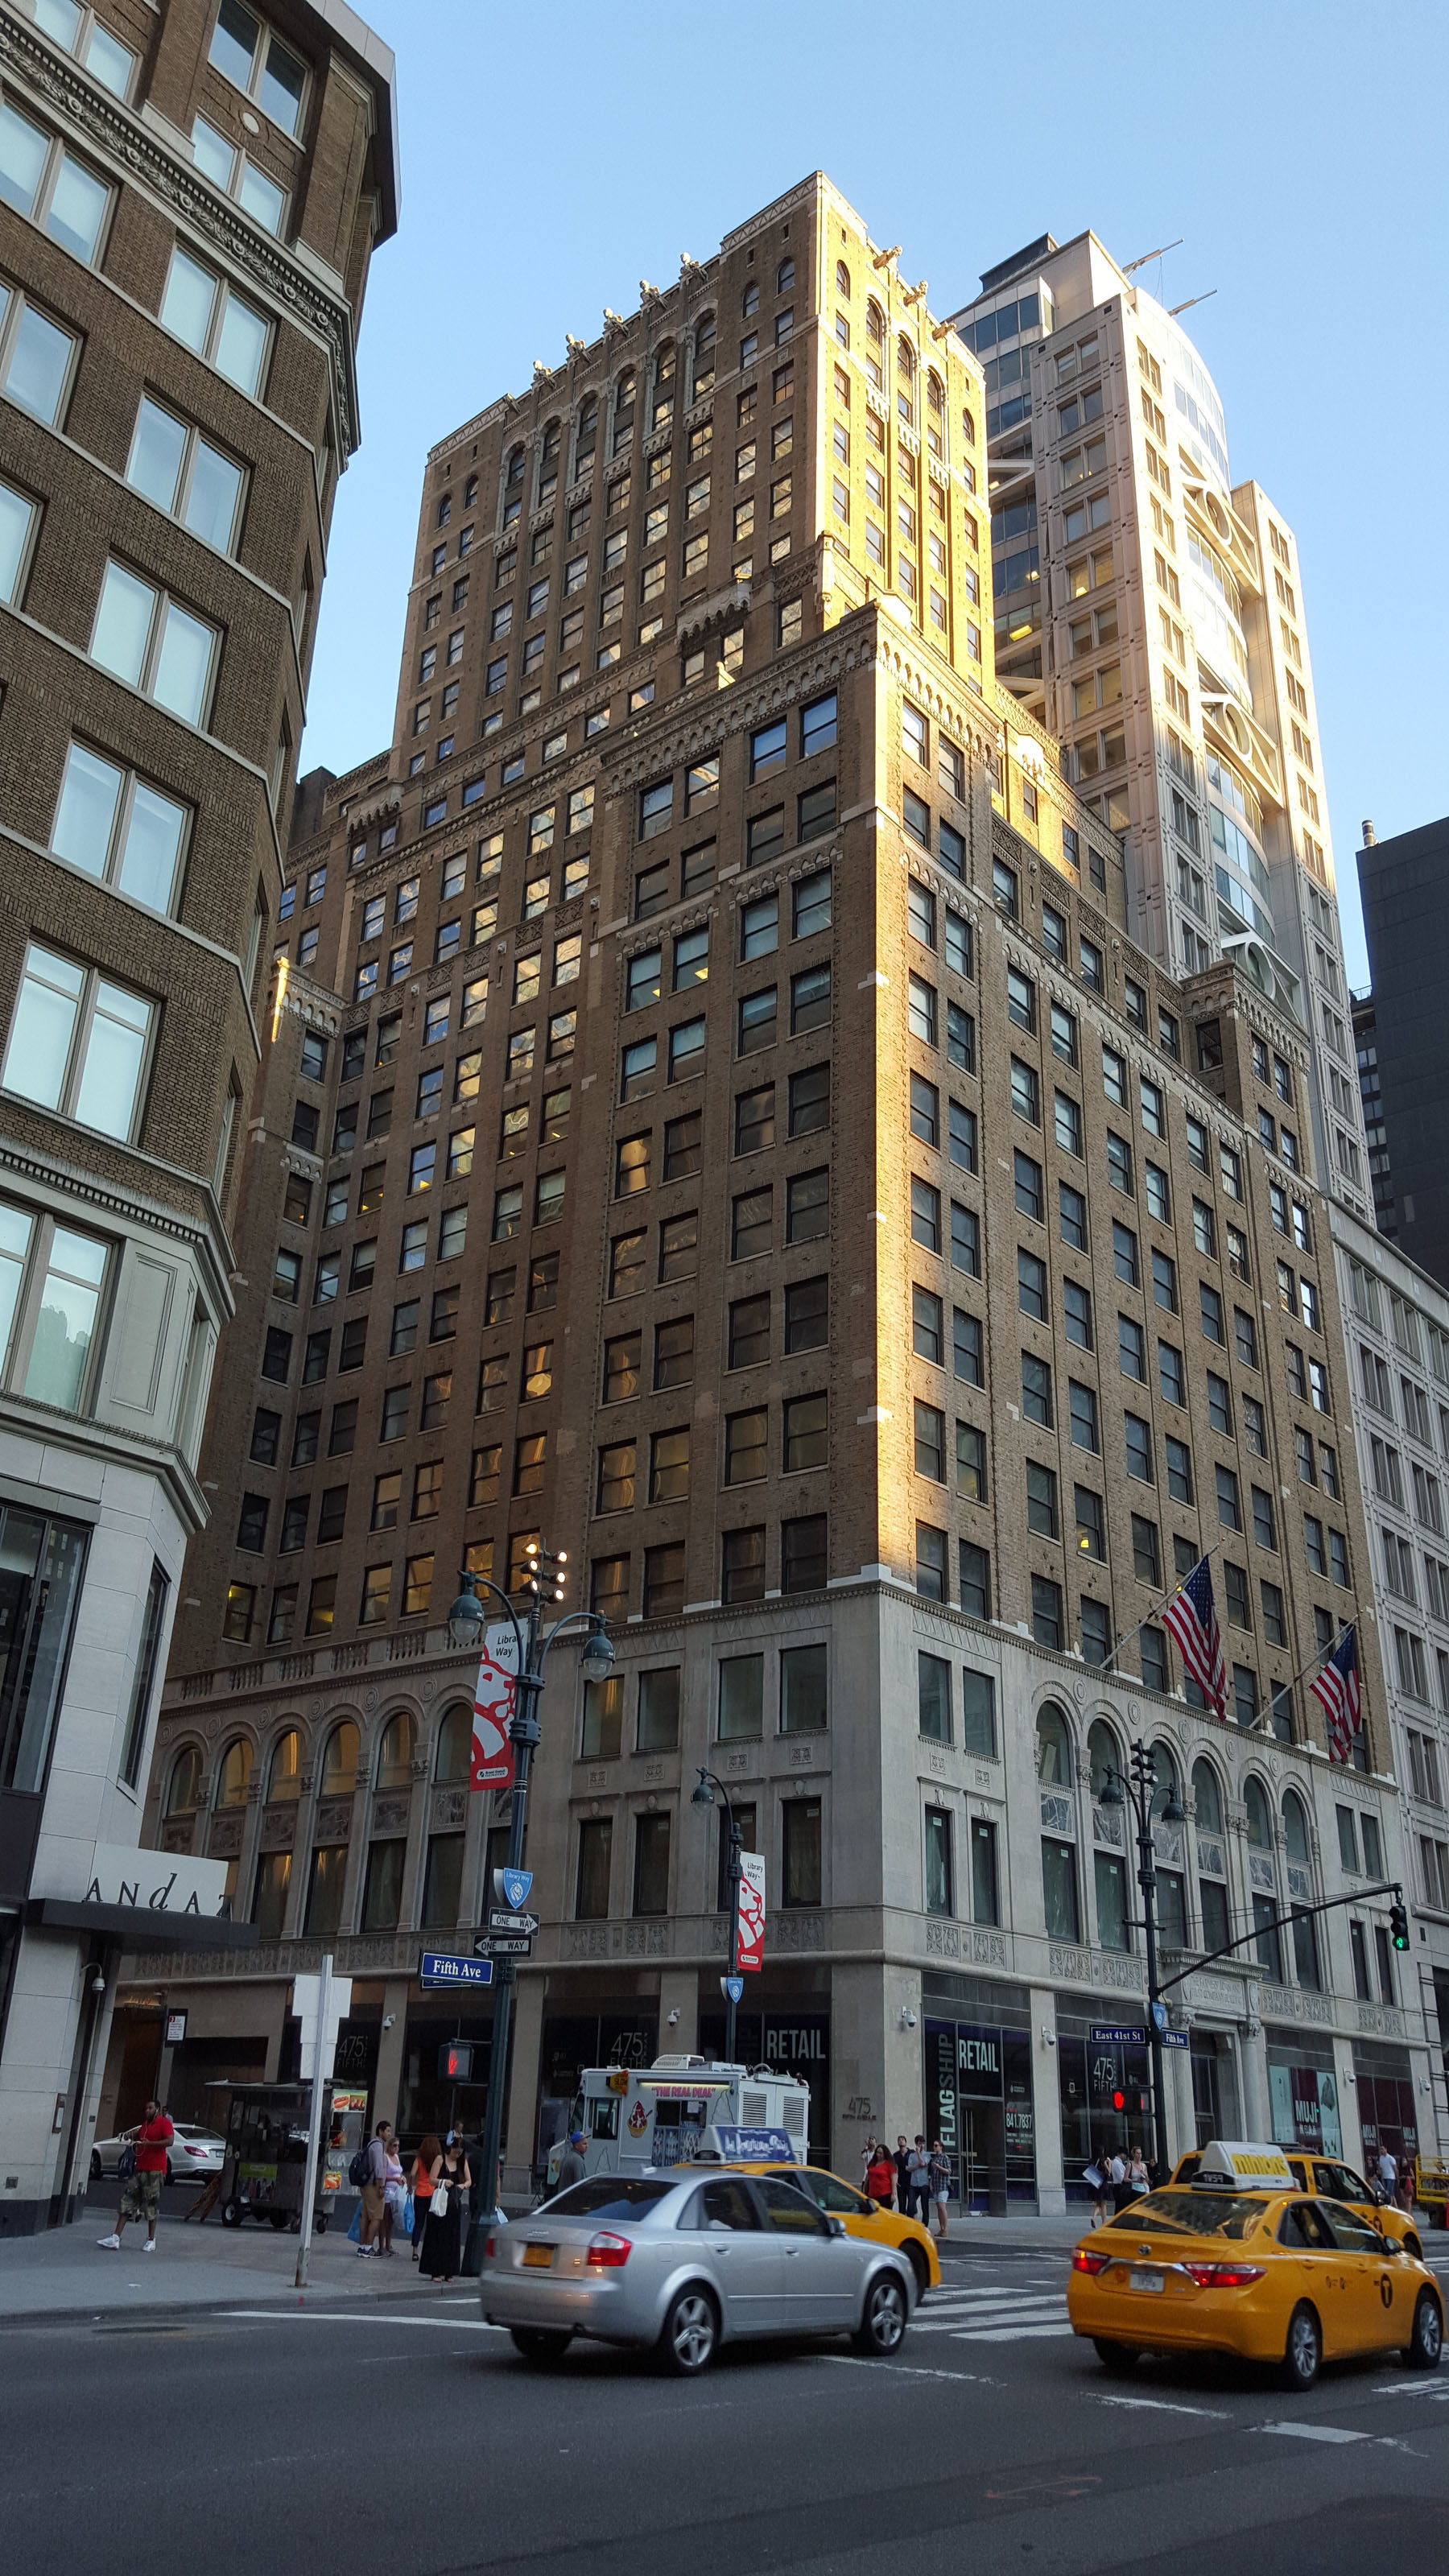 475 Fifth Avenue, the Farmers' Loan & Trust Building